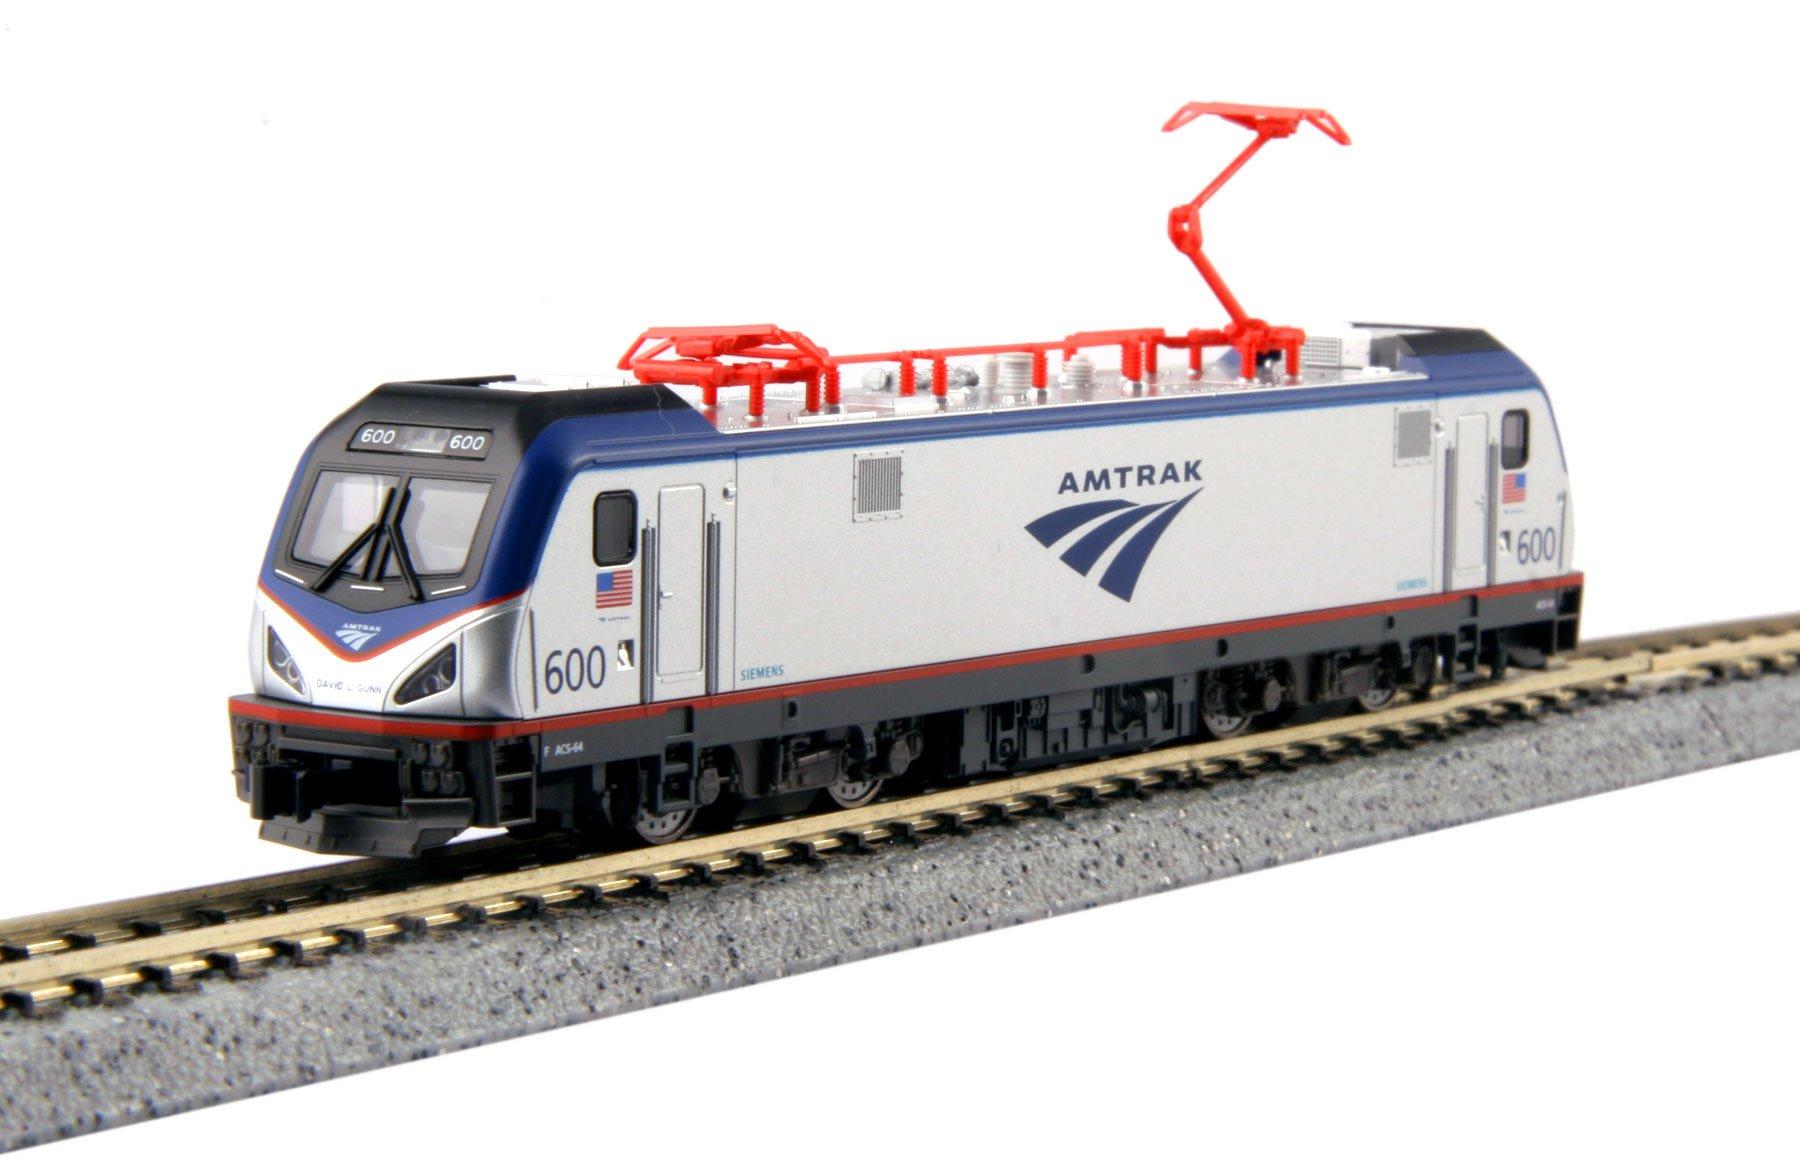 Kato 137-3001-DCC N Siemens ACS-64 Amtrak #600 David L Gunn DCC Installed